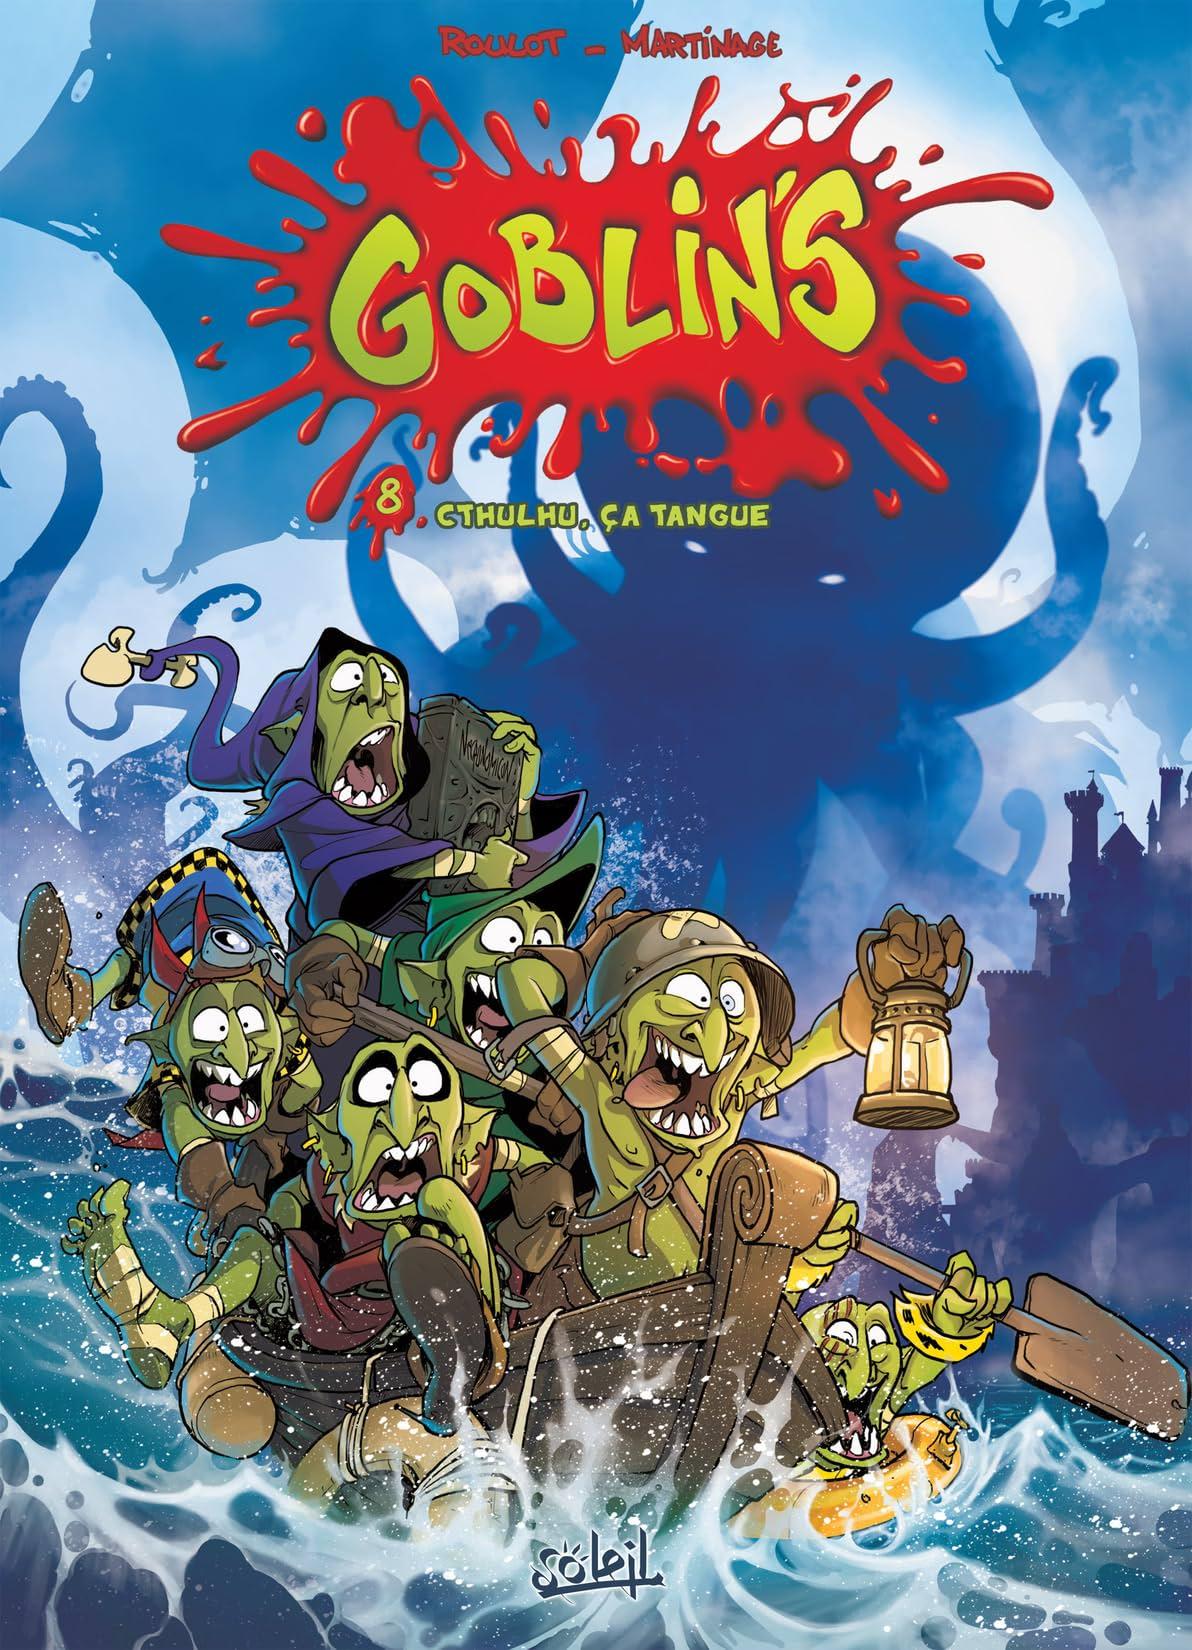 Goblin's Vol. 8: Cthulhu, ça tangue